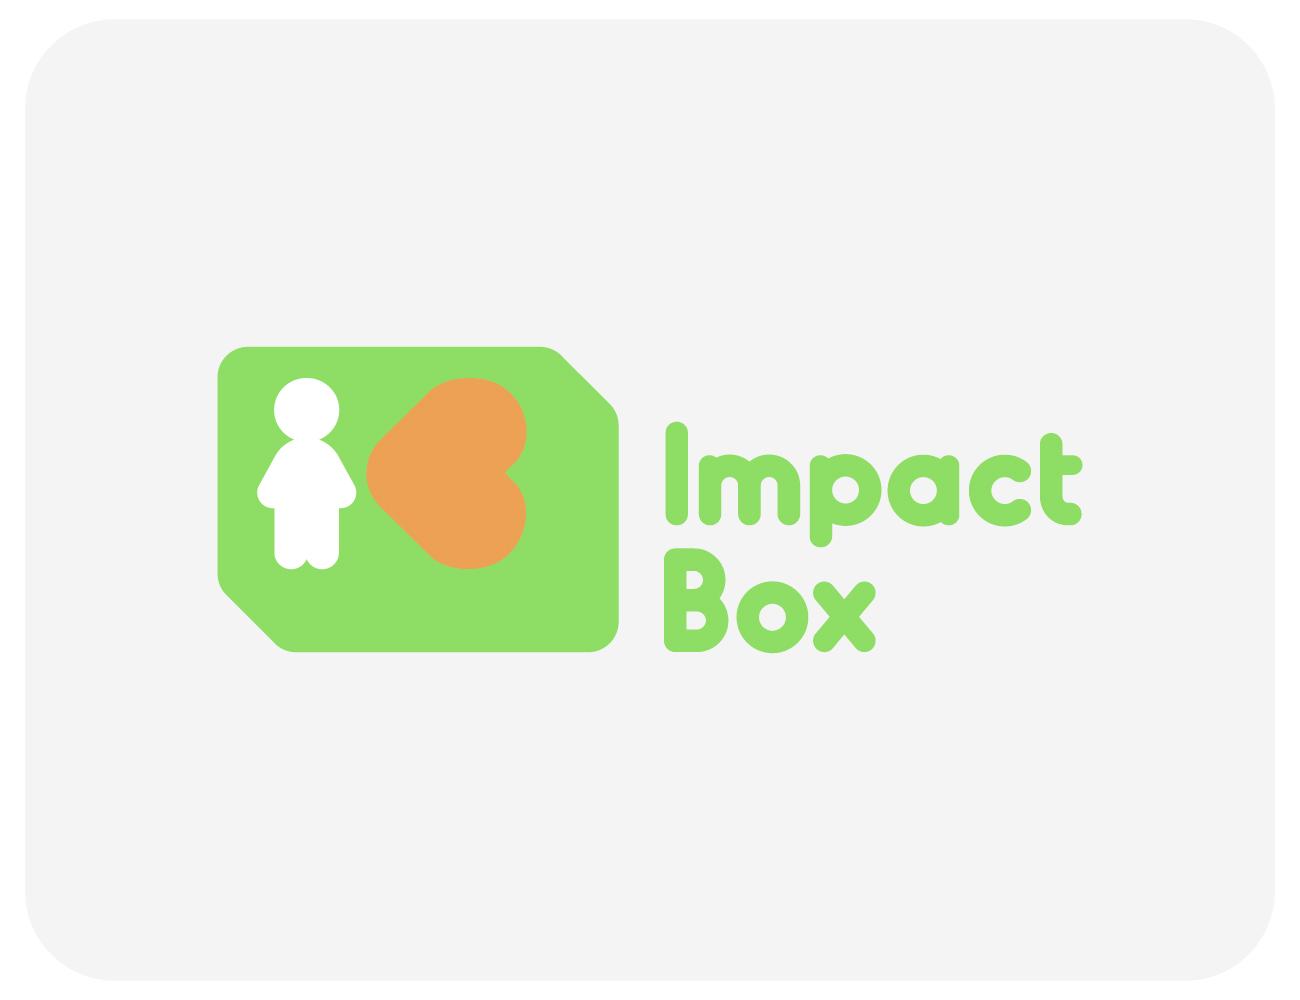 Impact Box